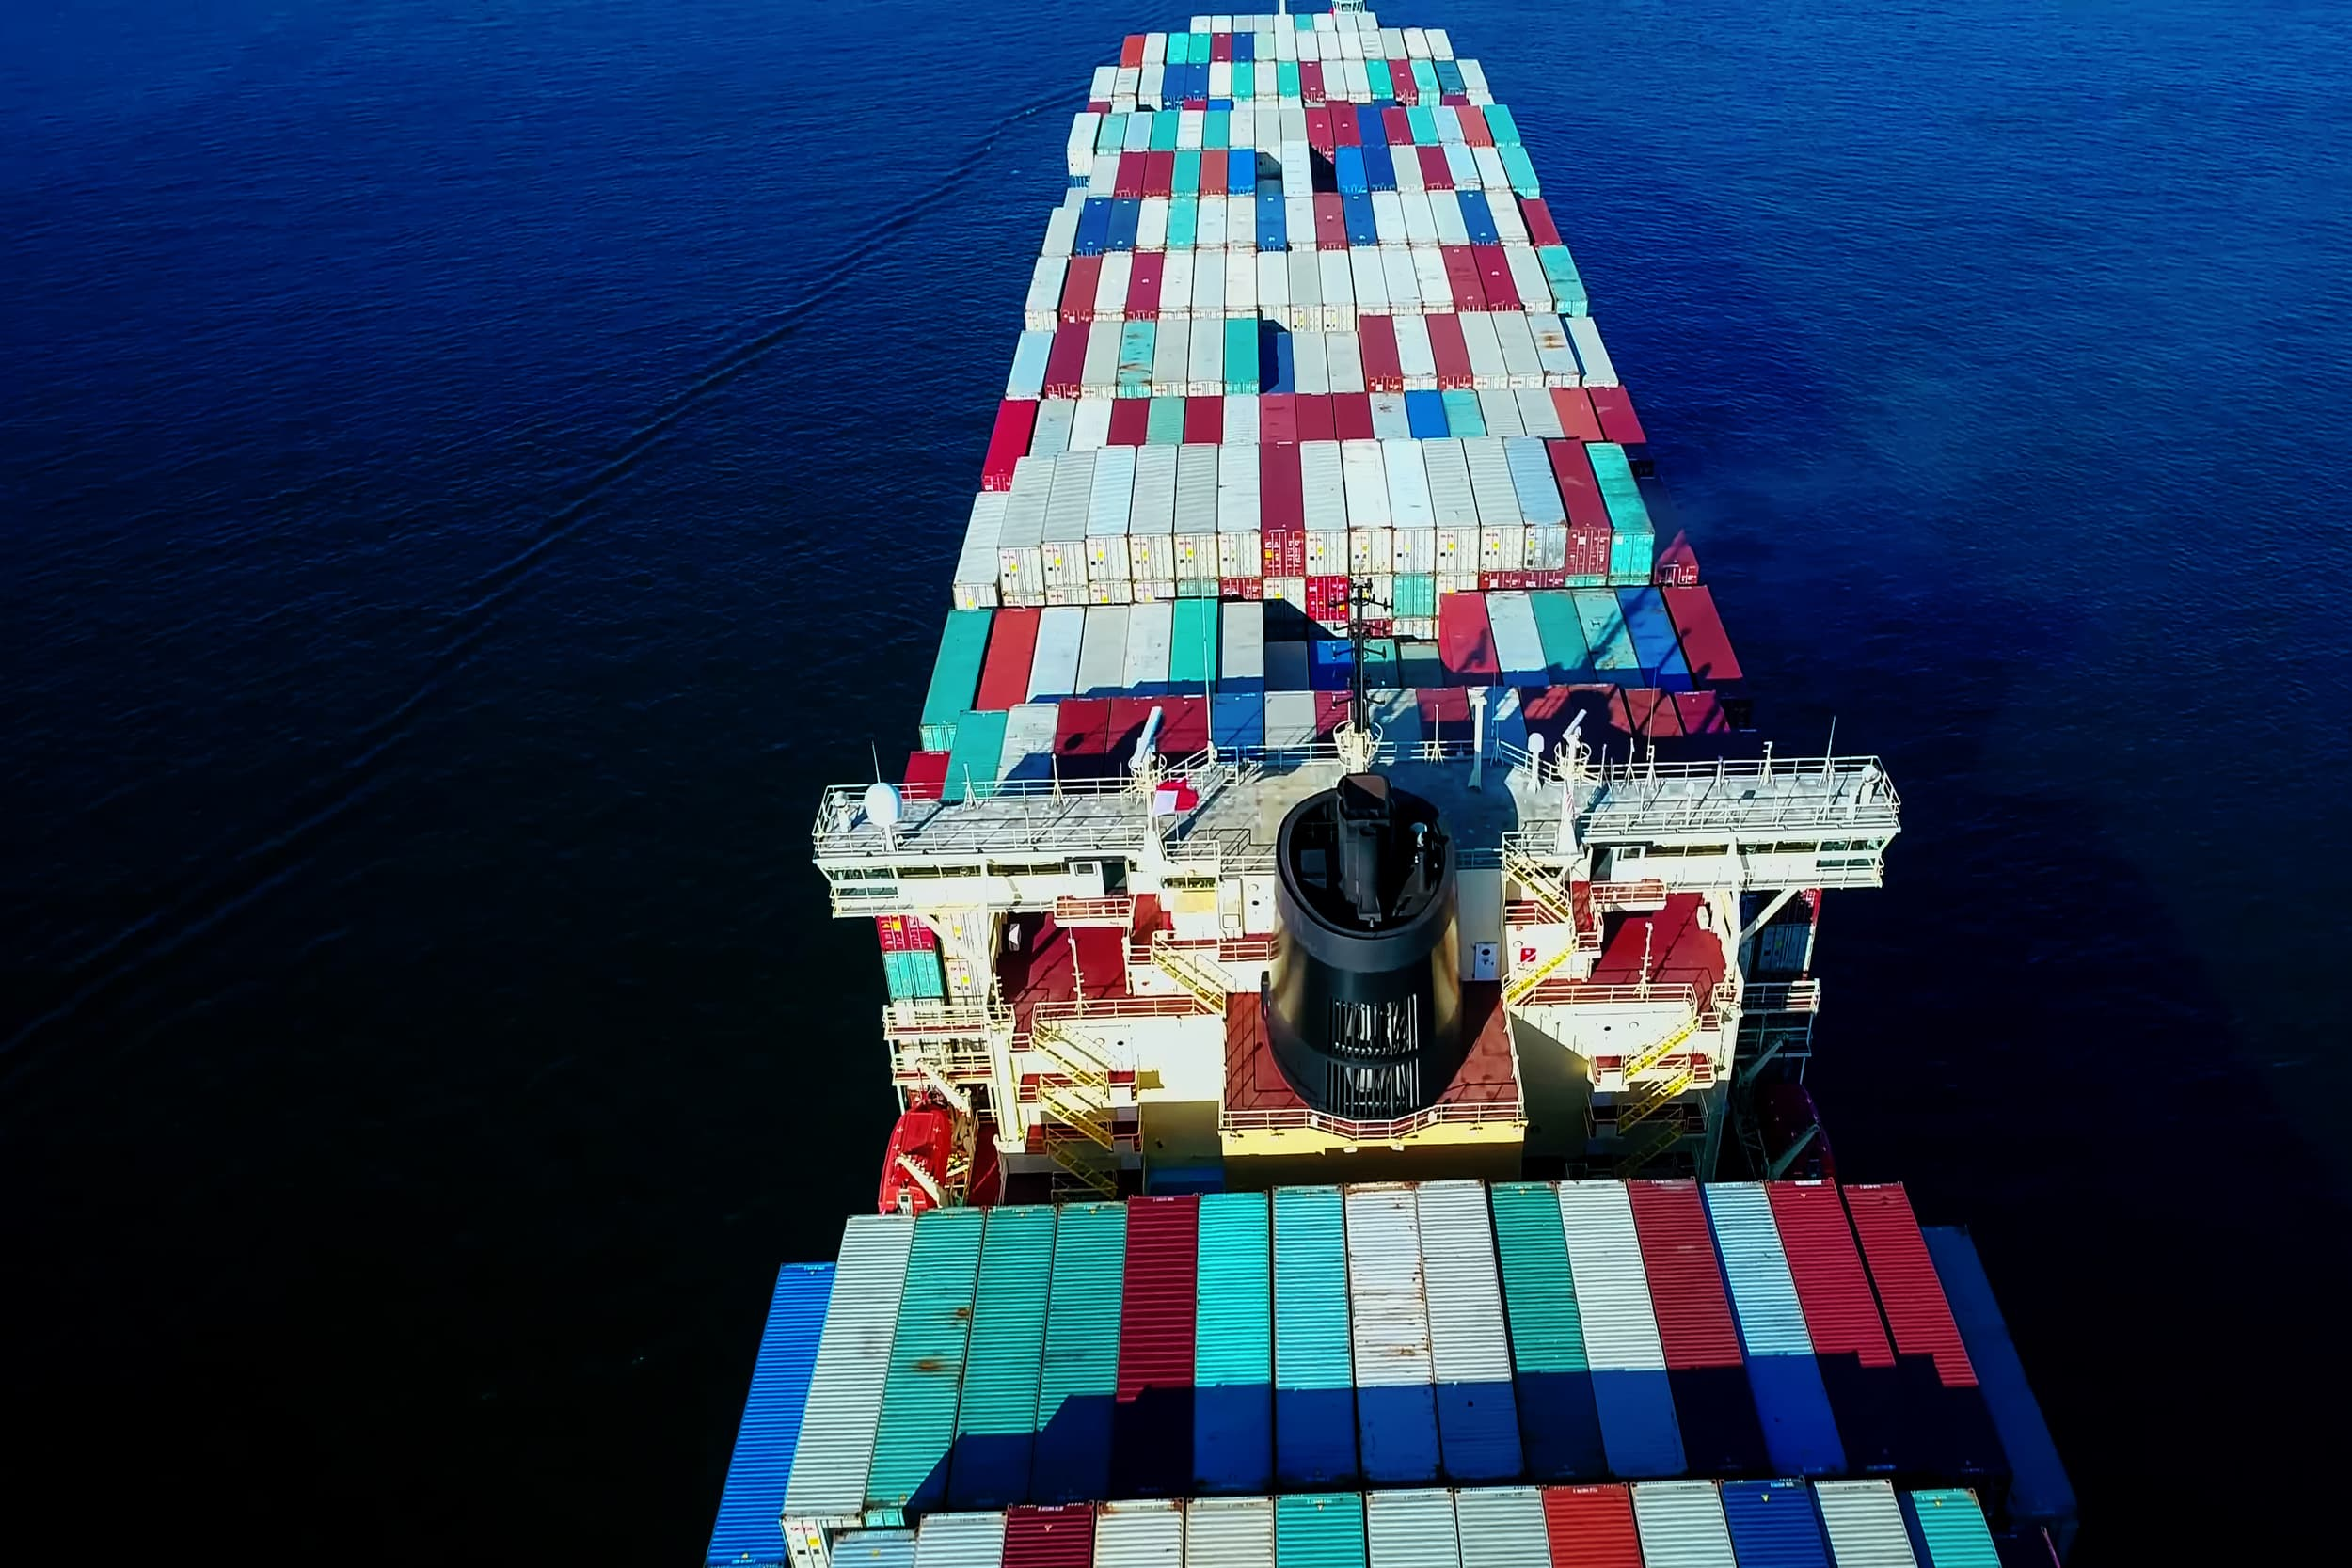 Compliance Training Online International Maritime Dangerous Goods Code course